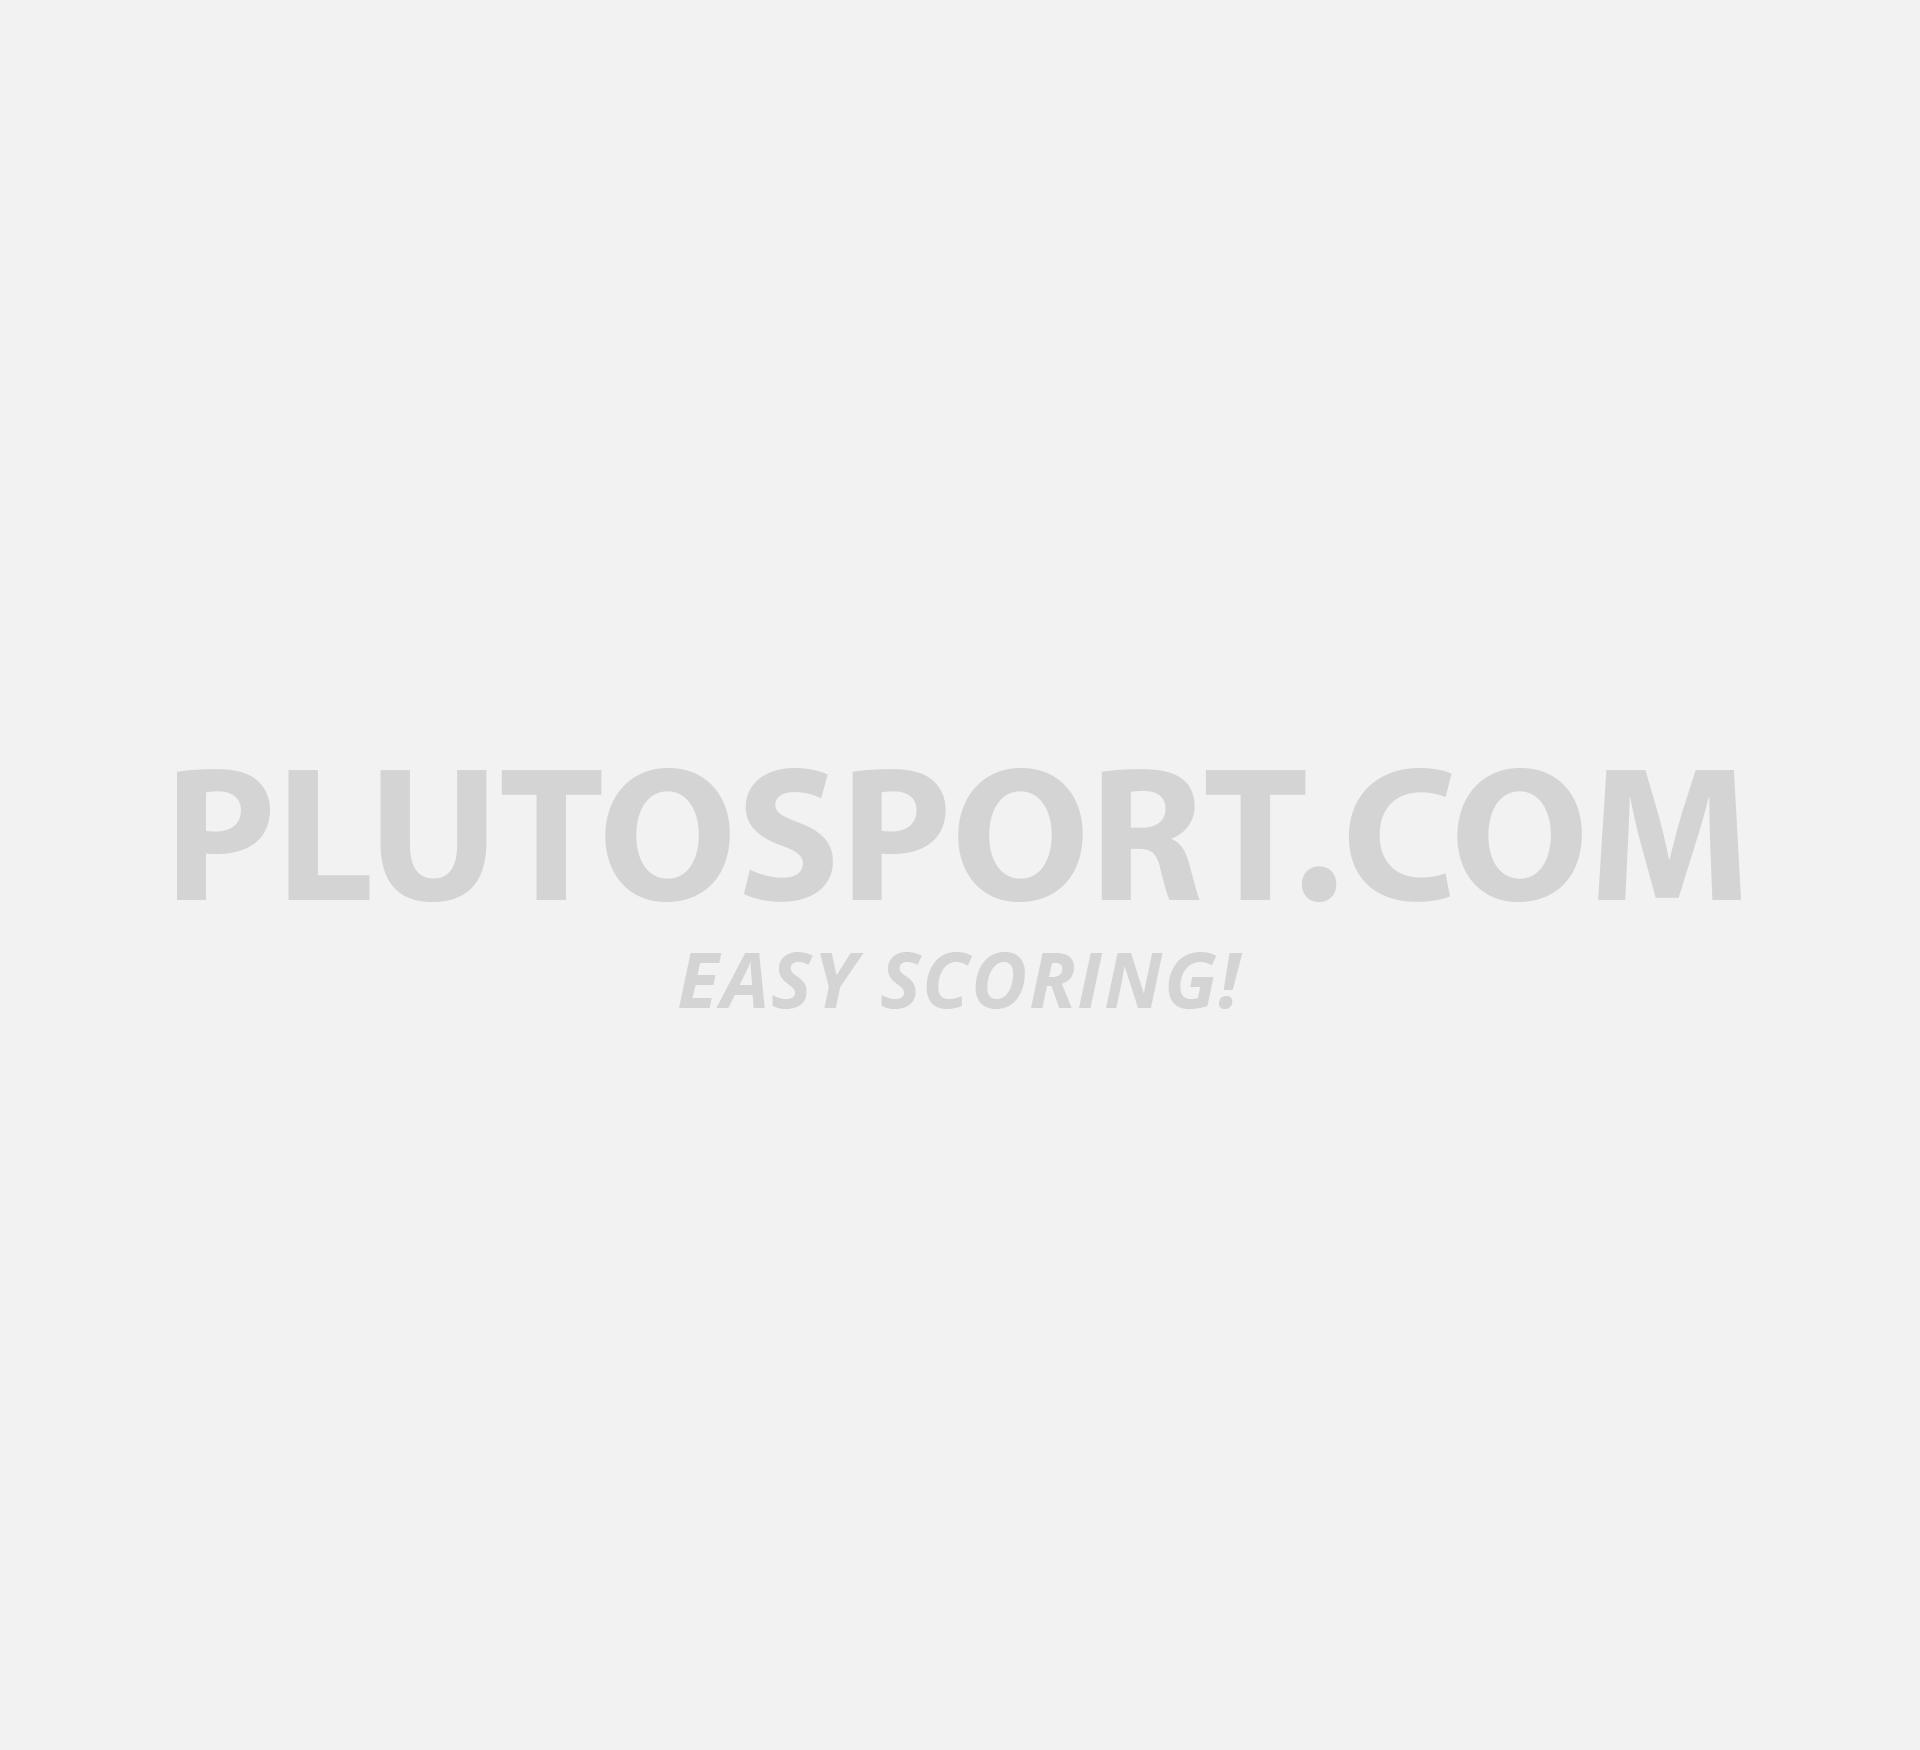 3409b270 Adidas Essentials 3-Stripe Polo-shirt Mens - Polo shirts - Clothing -  Tennis - Sports | Plutosport